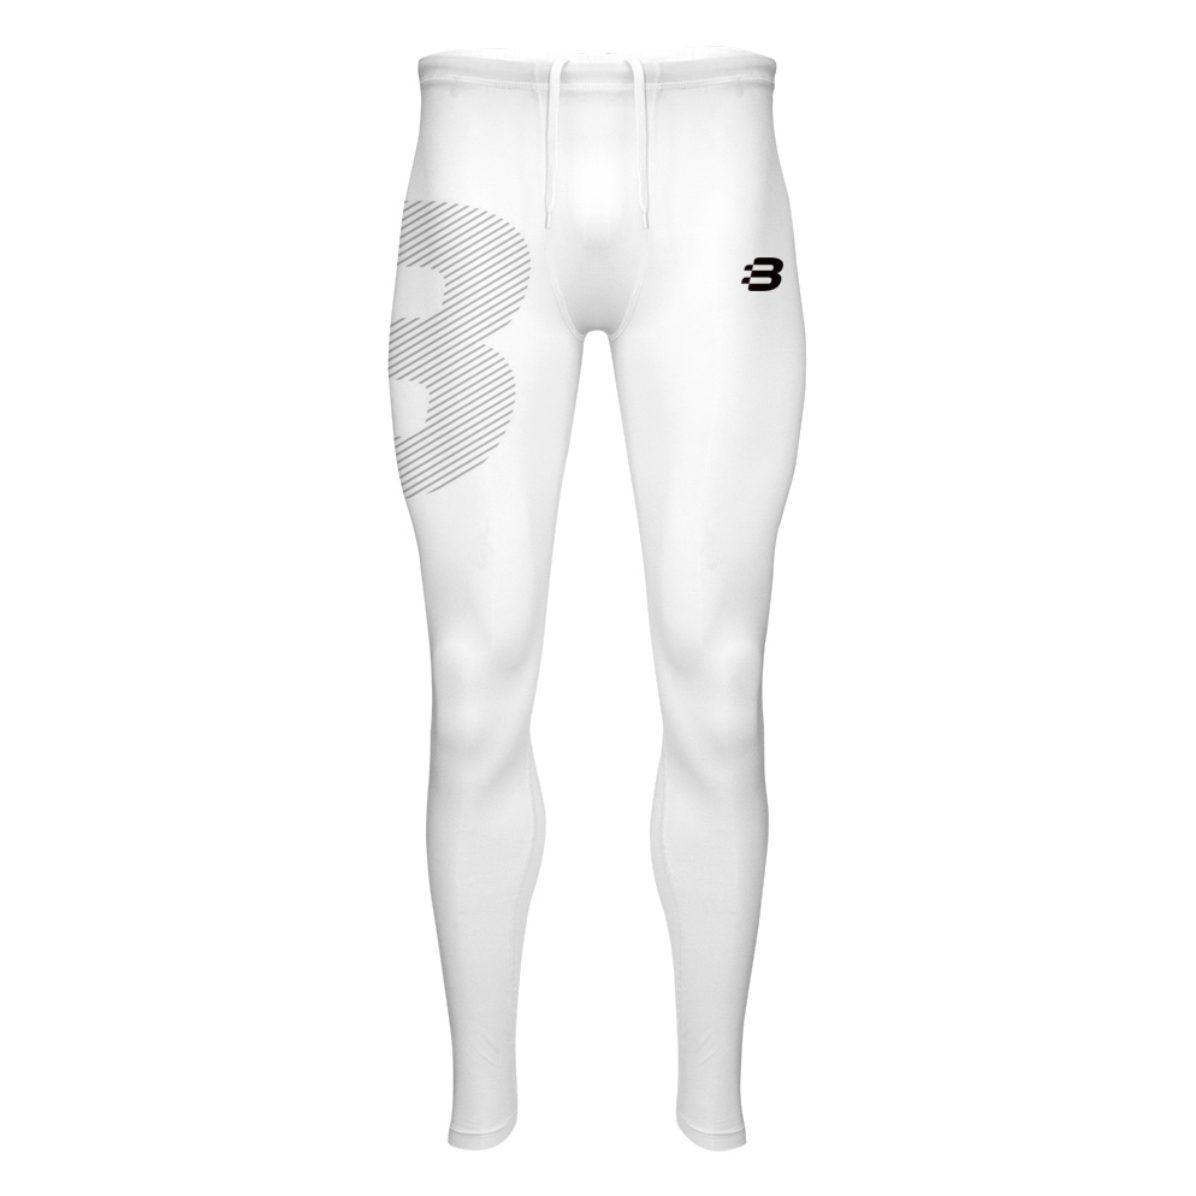 1c67d8d01b Mens Compression Tights - White - Blackchrome